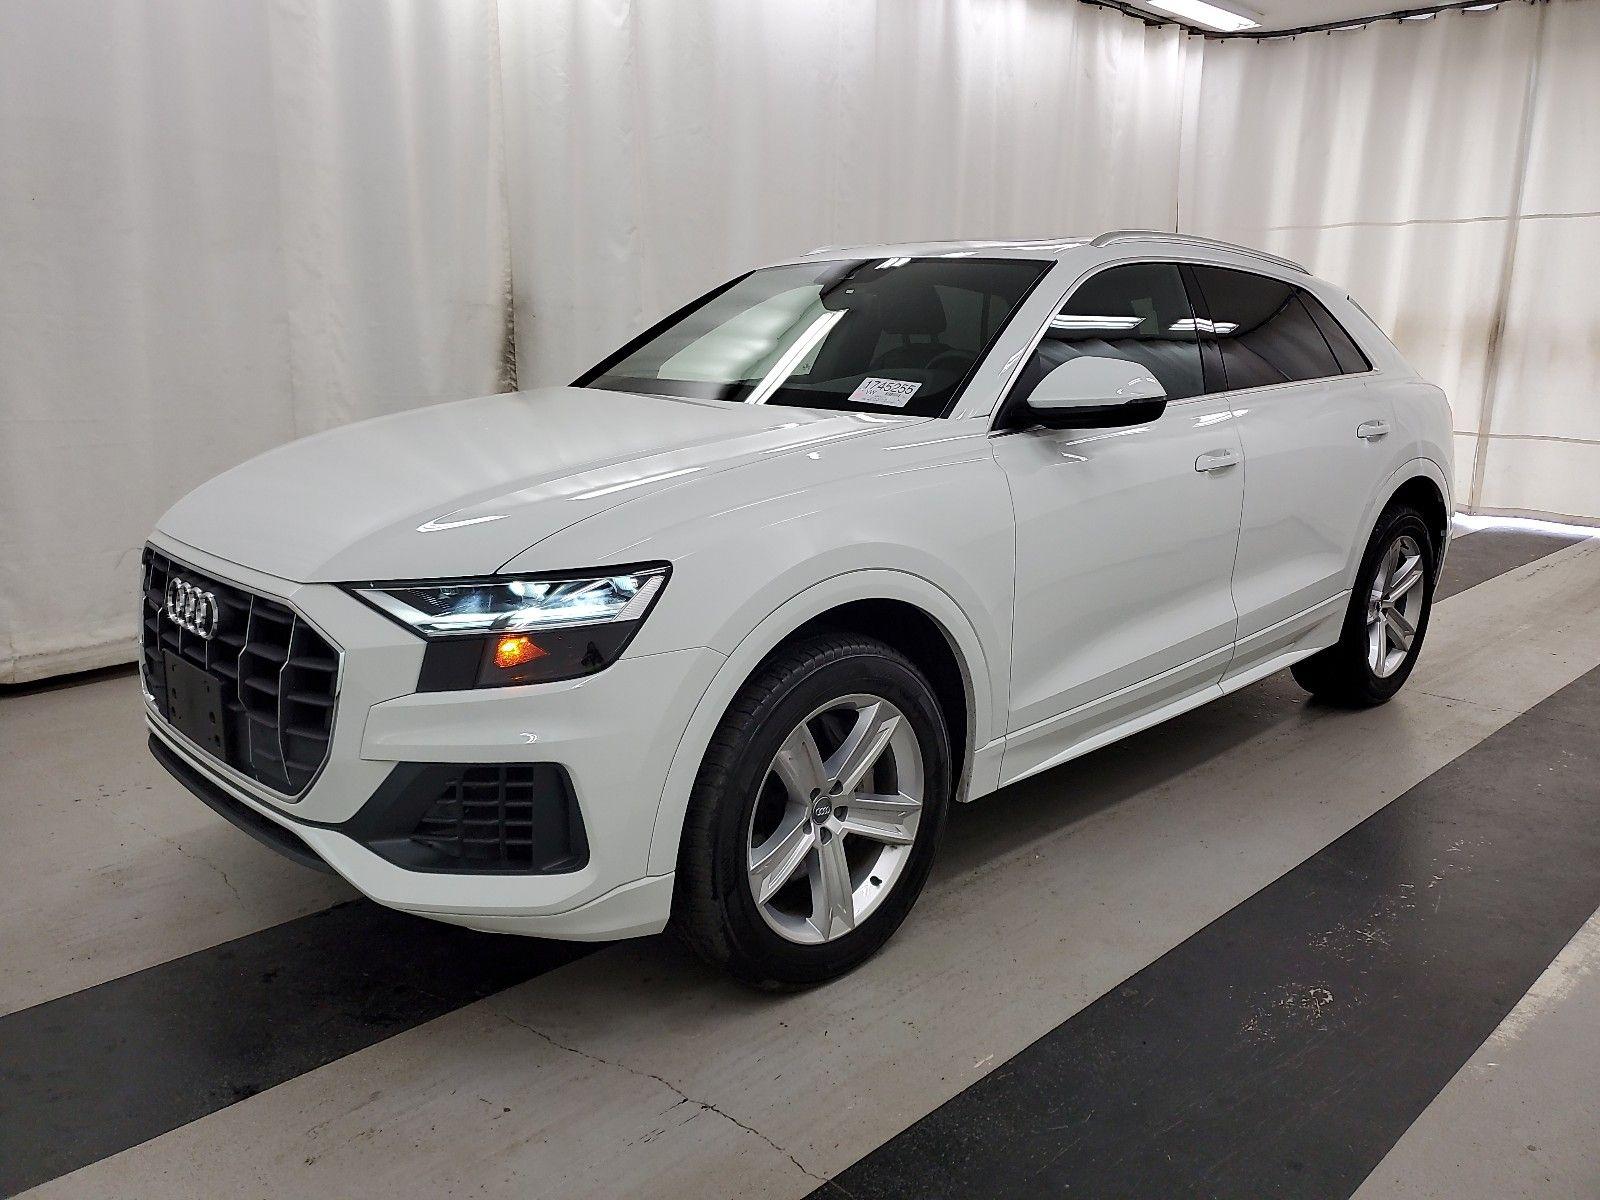 2019 Audi Not available 3.0. Lot 99912202797 Vin WA1AVAF17KD020098